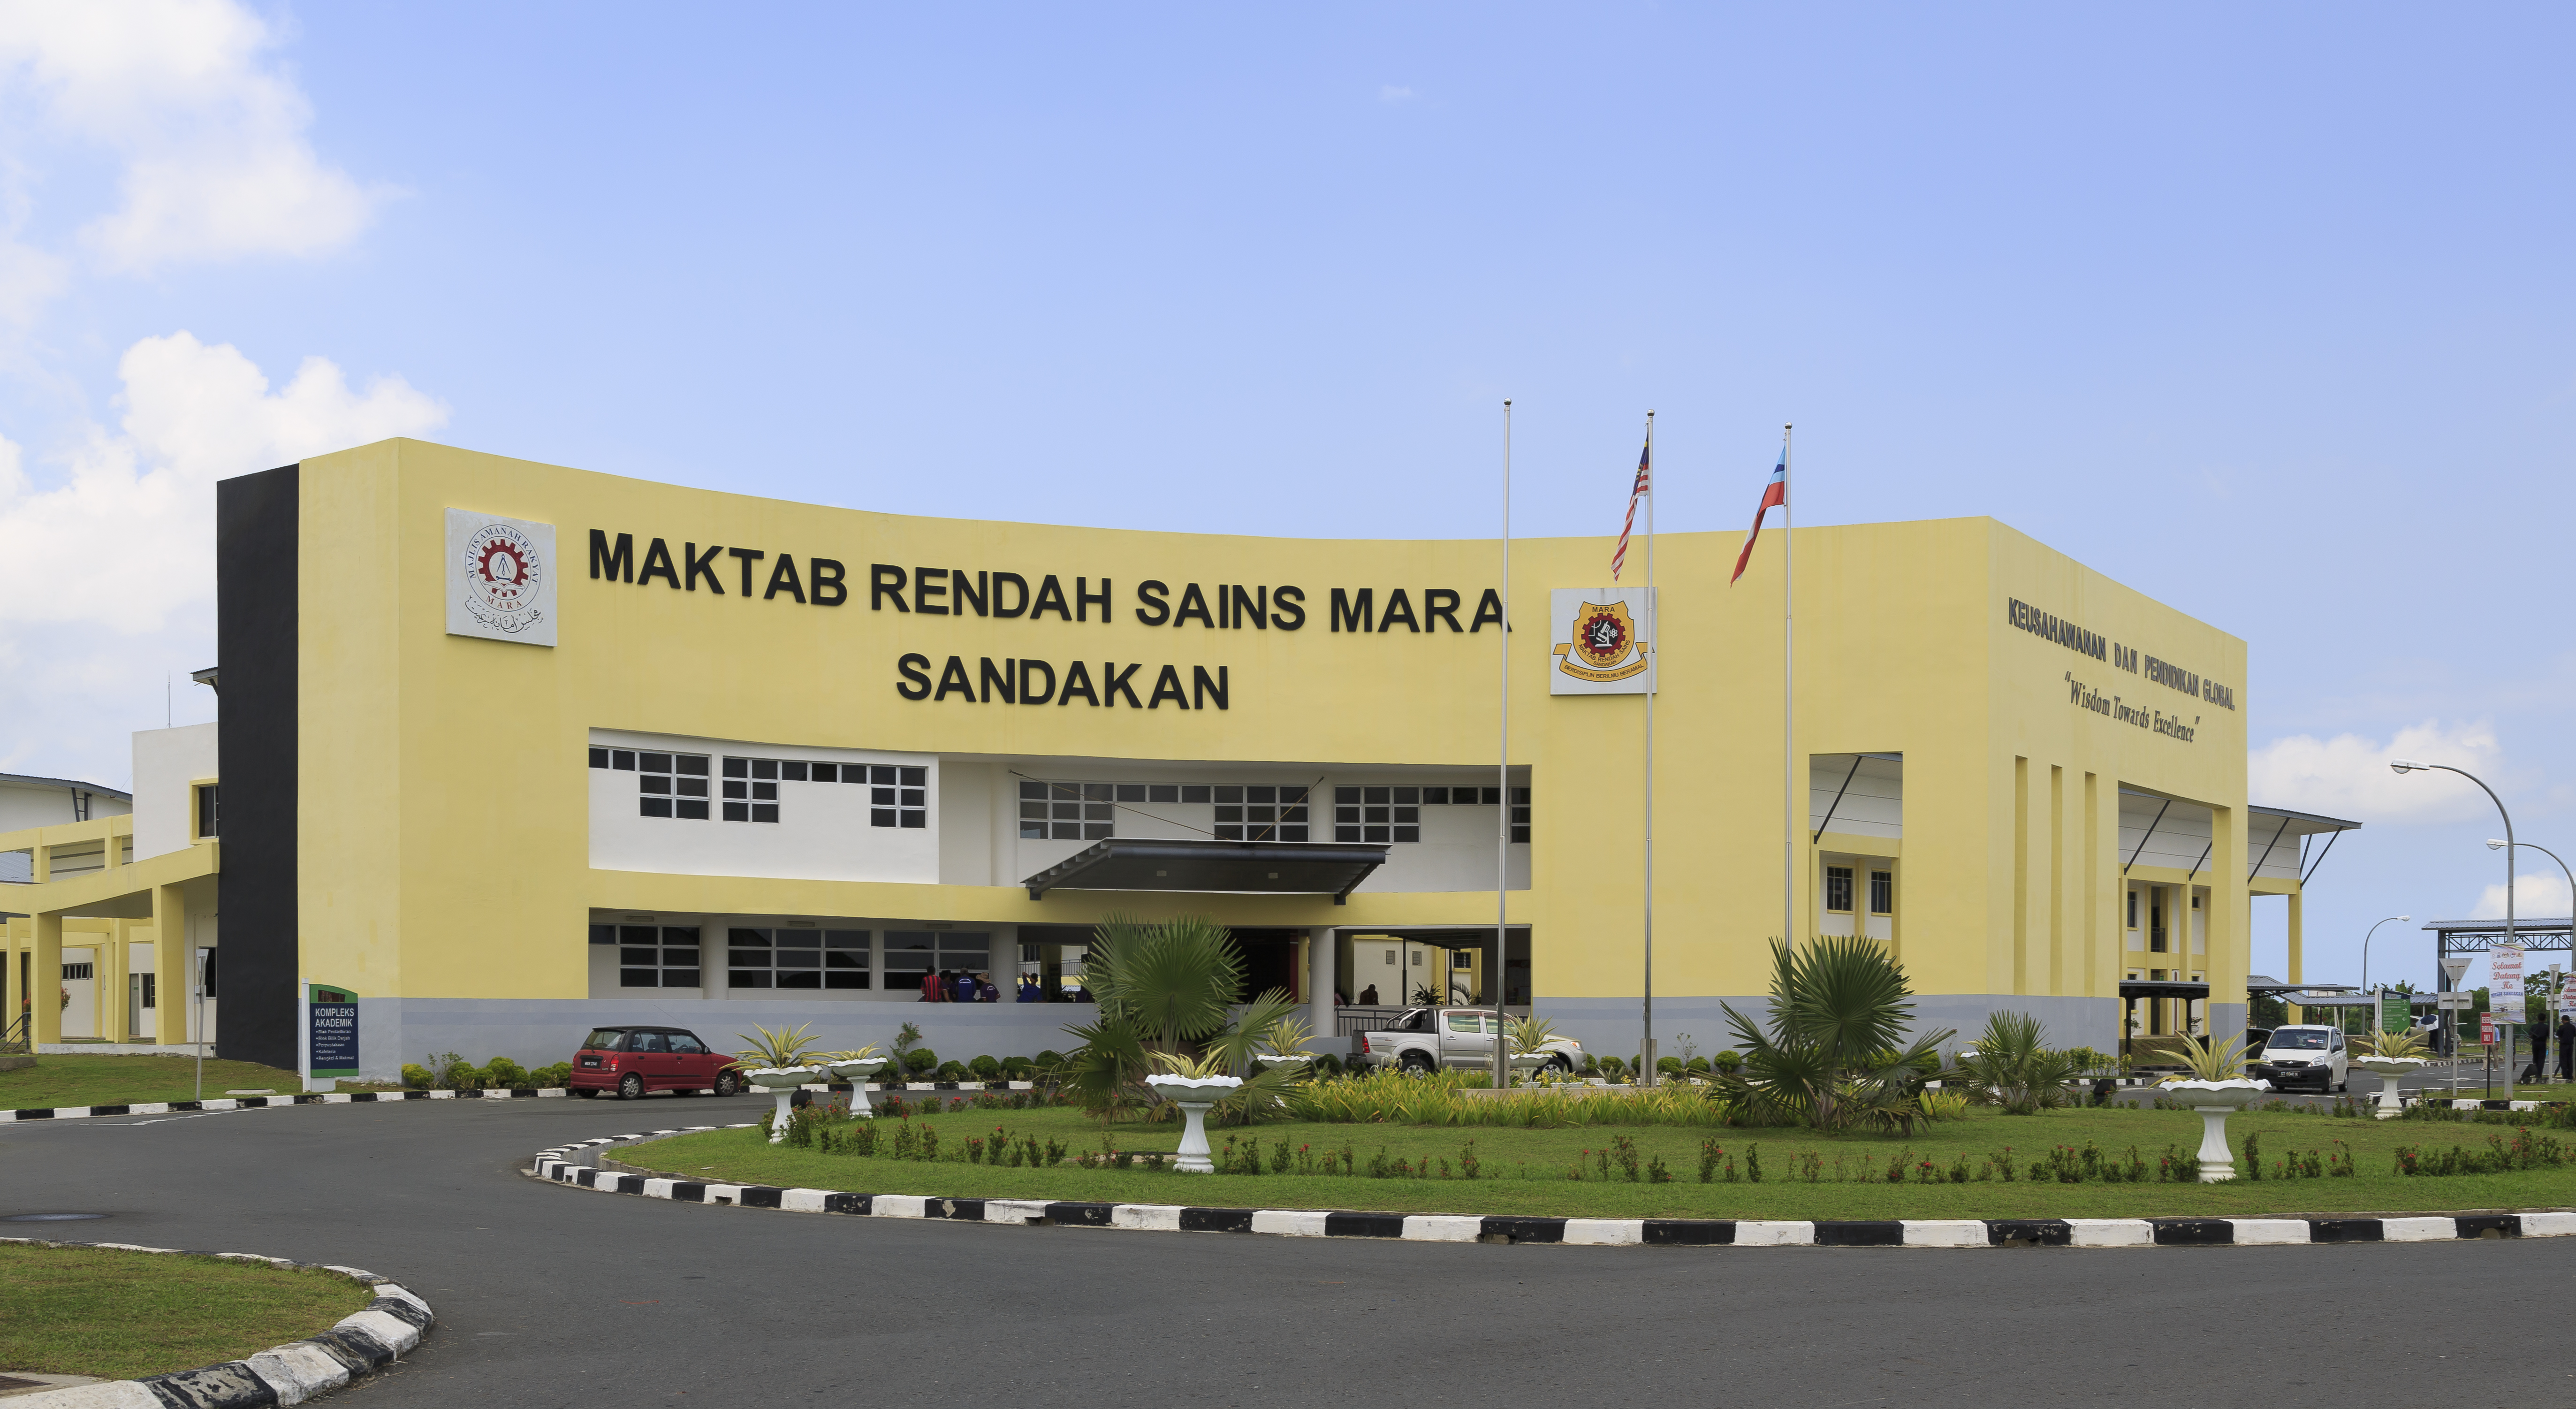 File Sandakan Sabah Maktab Rendah Sains Mara 01 Jpg Wikimedia Commons